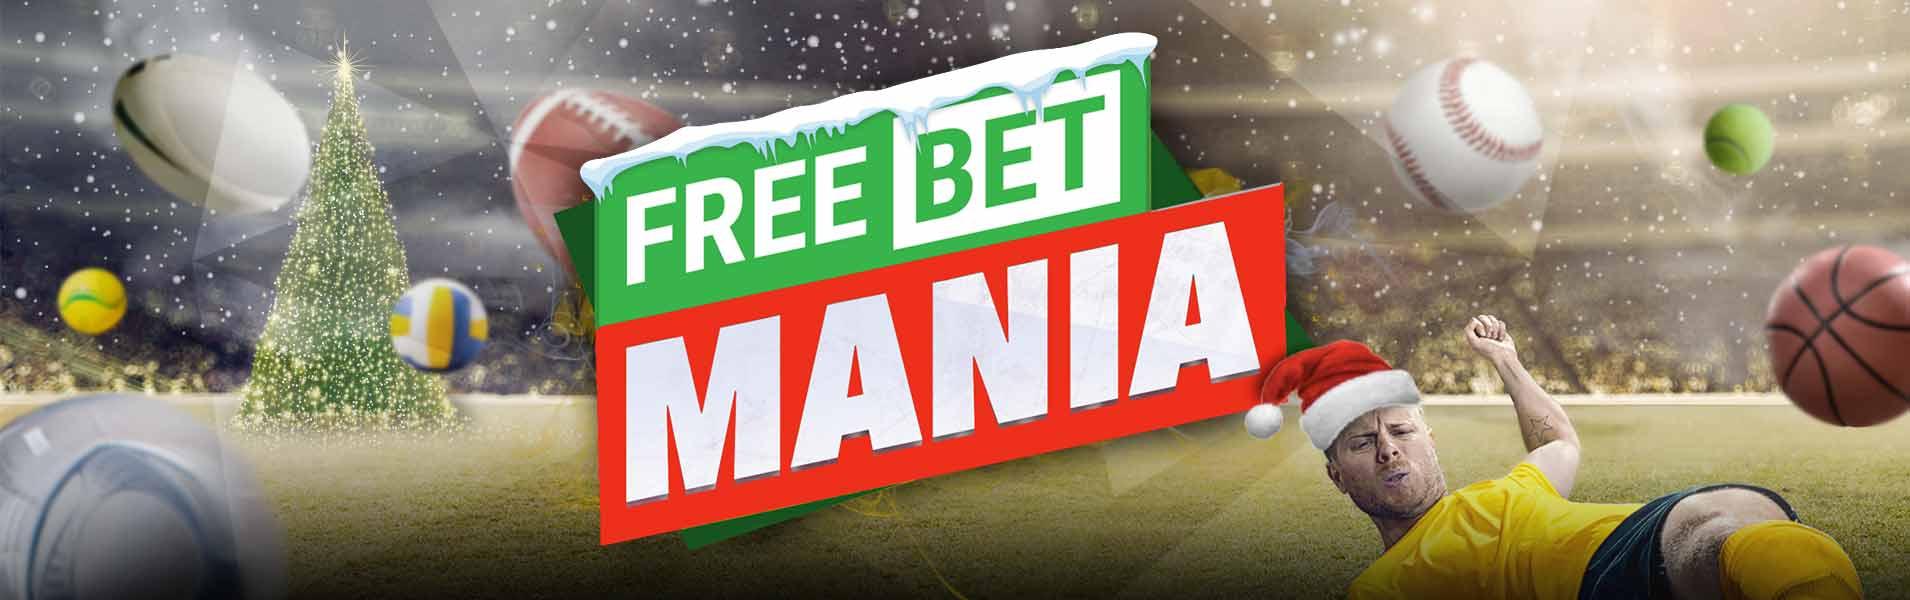 sportingbet freebet mania